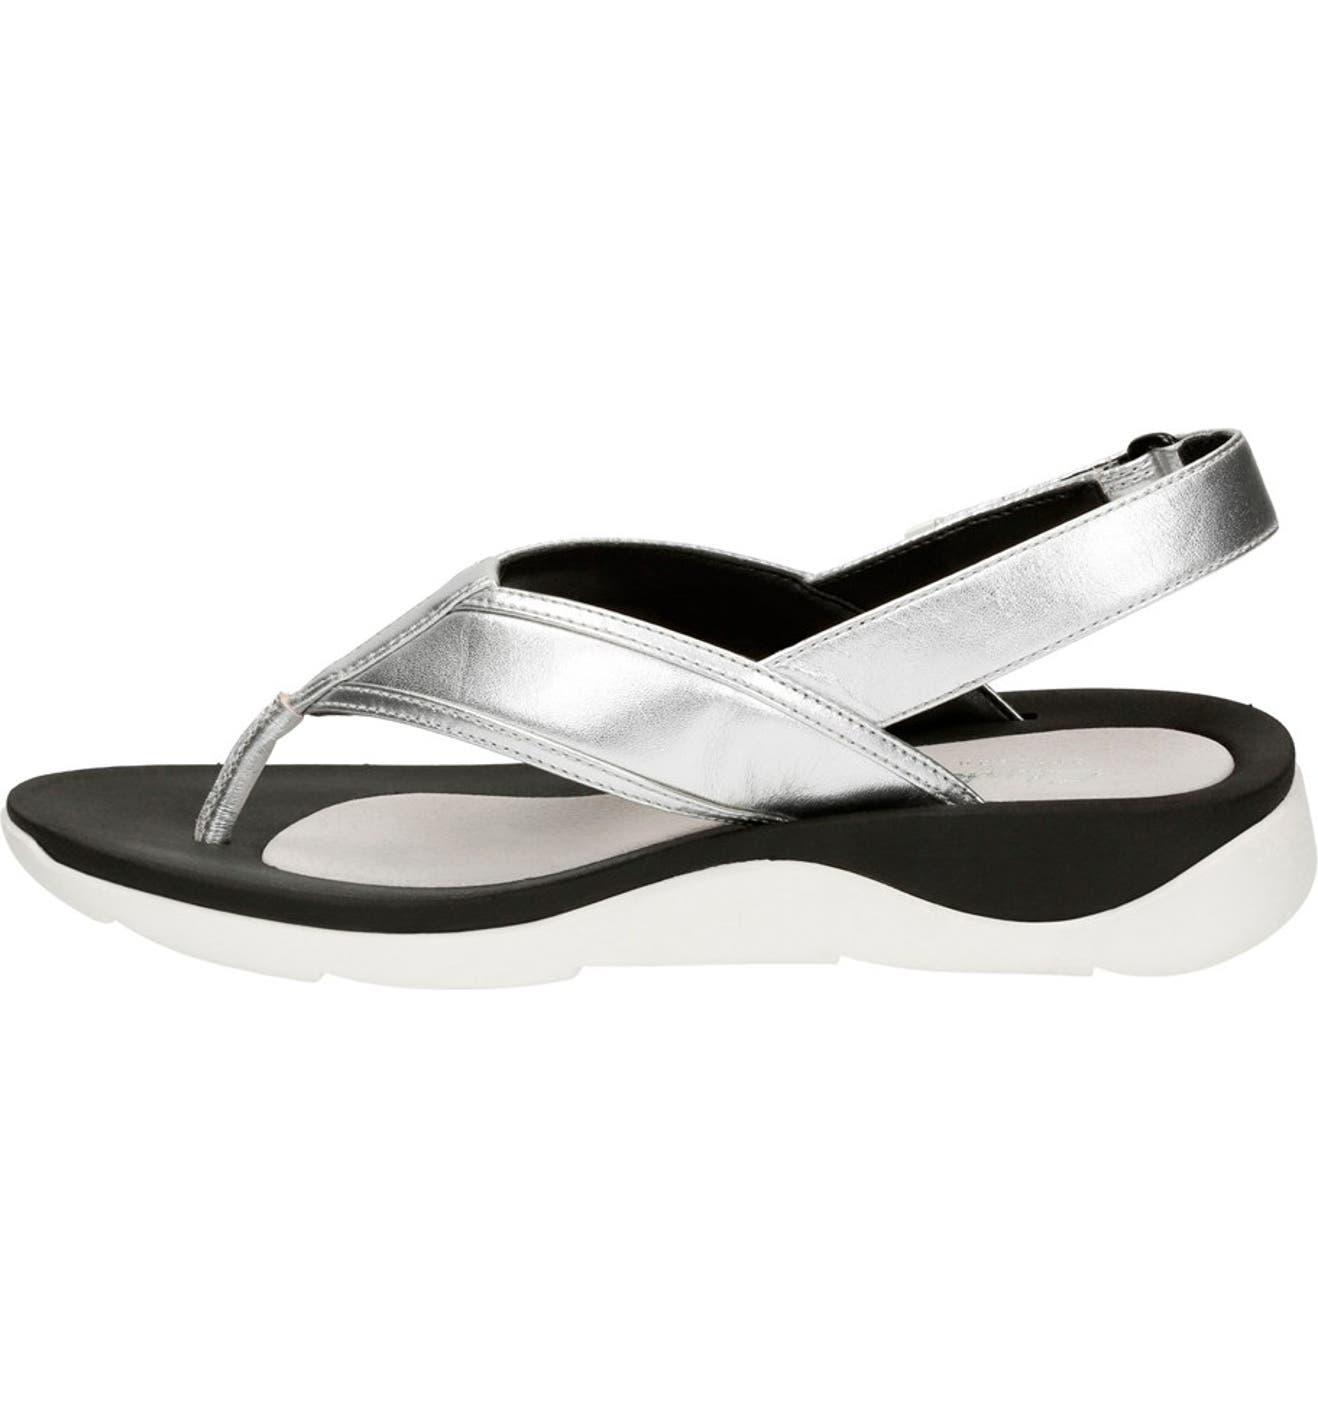 bbb3f7c84e8a8 'Caval Kora' Sandal